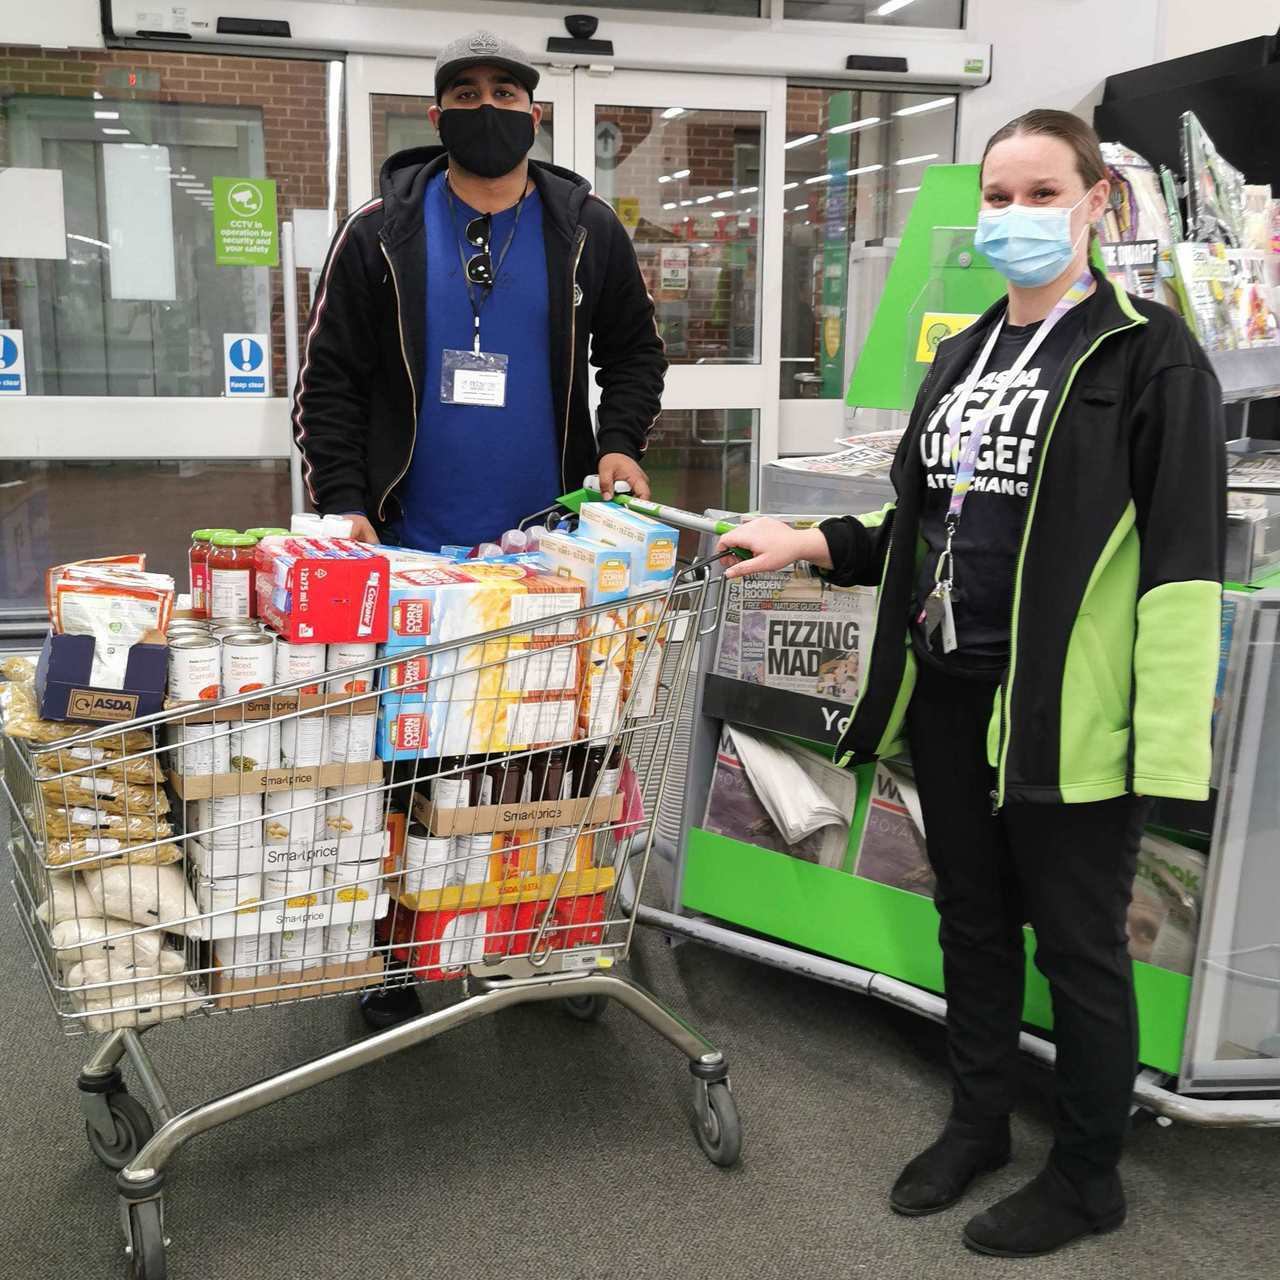 Donation of essential foods and toiletries to Freshstart Smart | Asda Wythenshawe